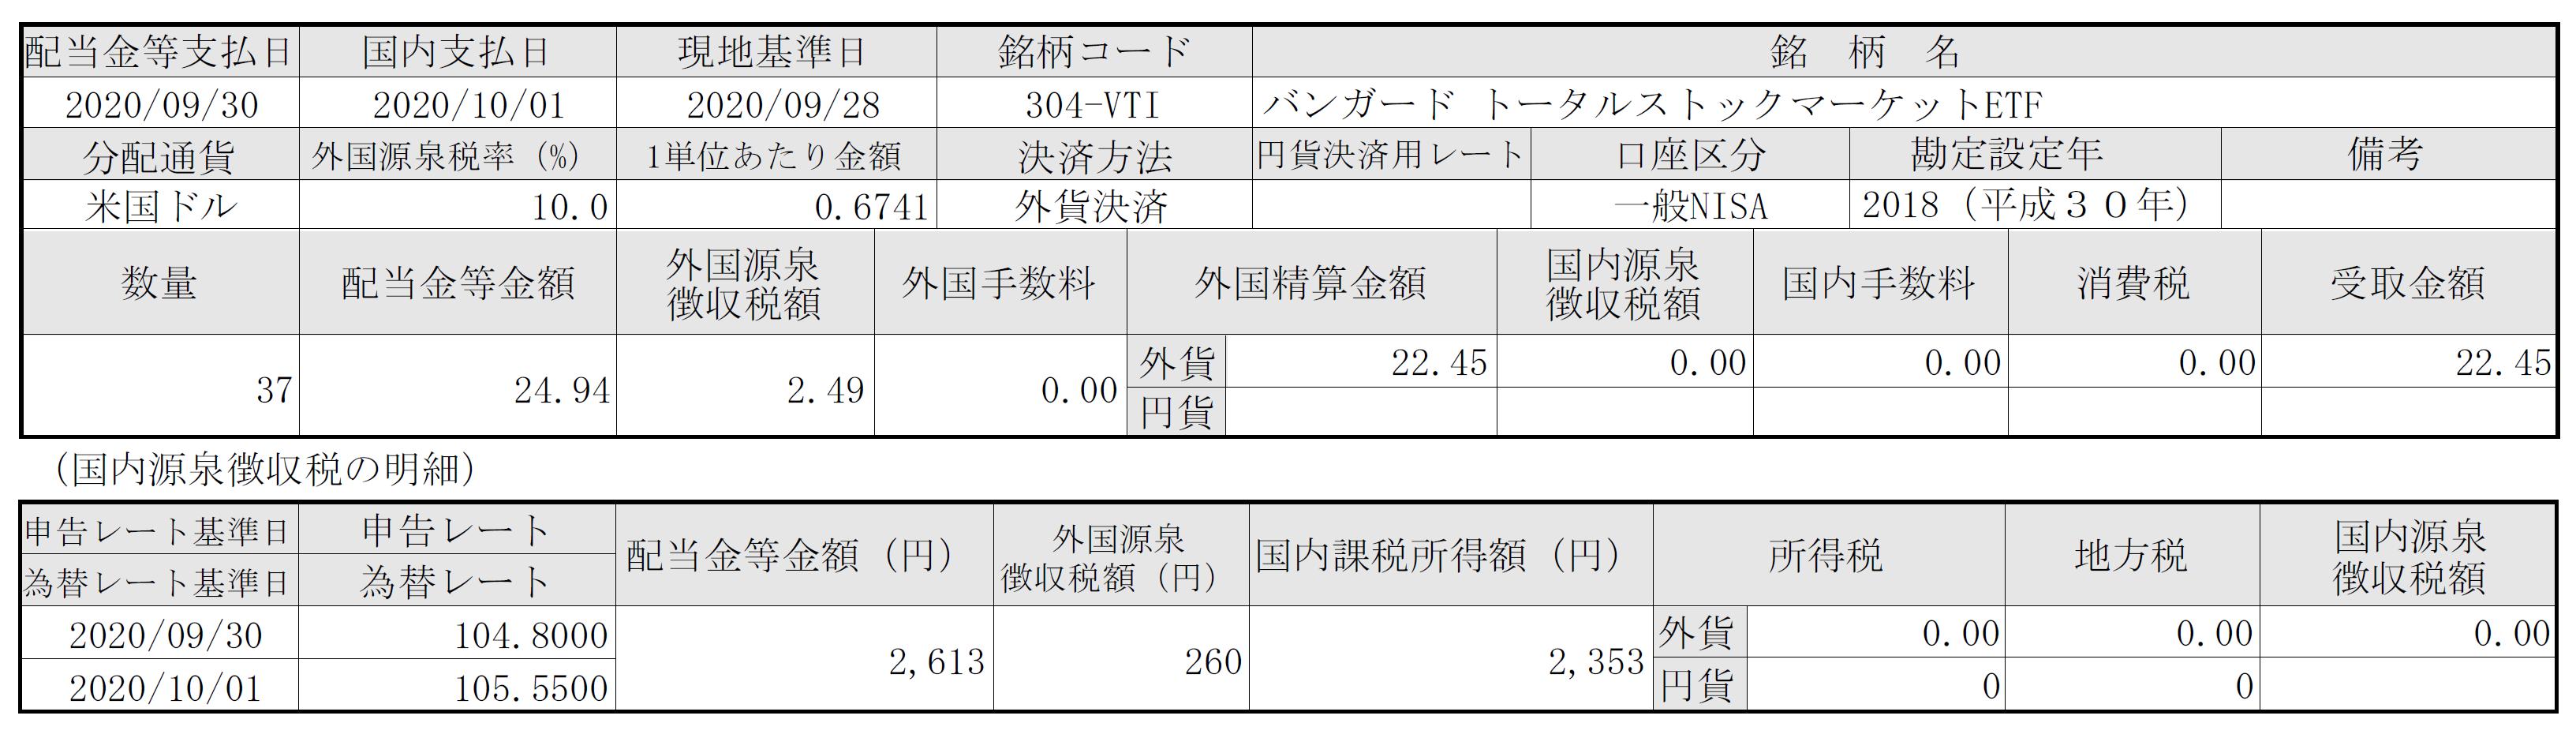 f:id:hodo-work:20201007163558p:plain